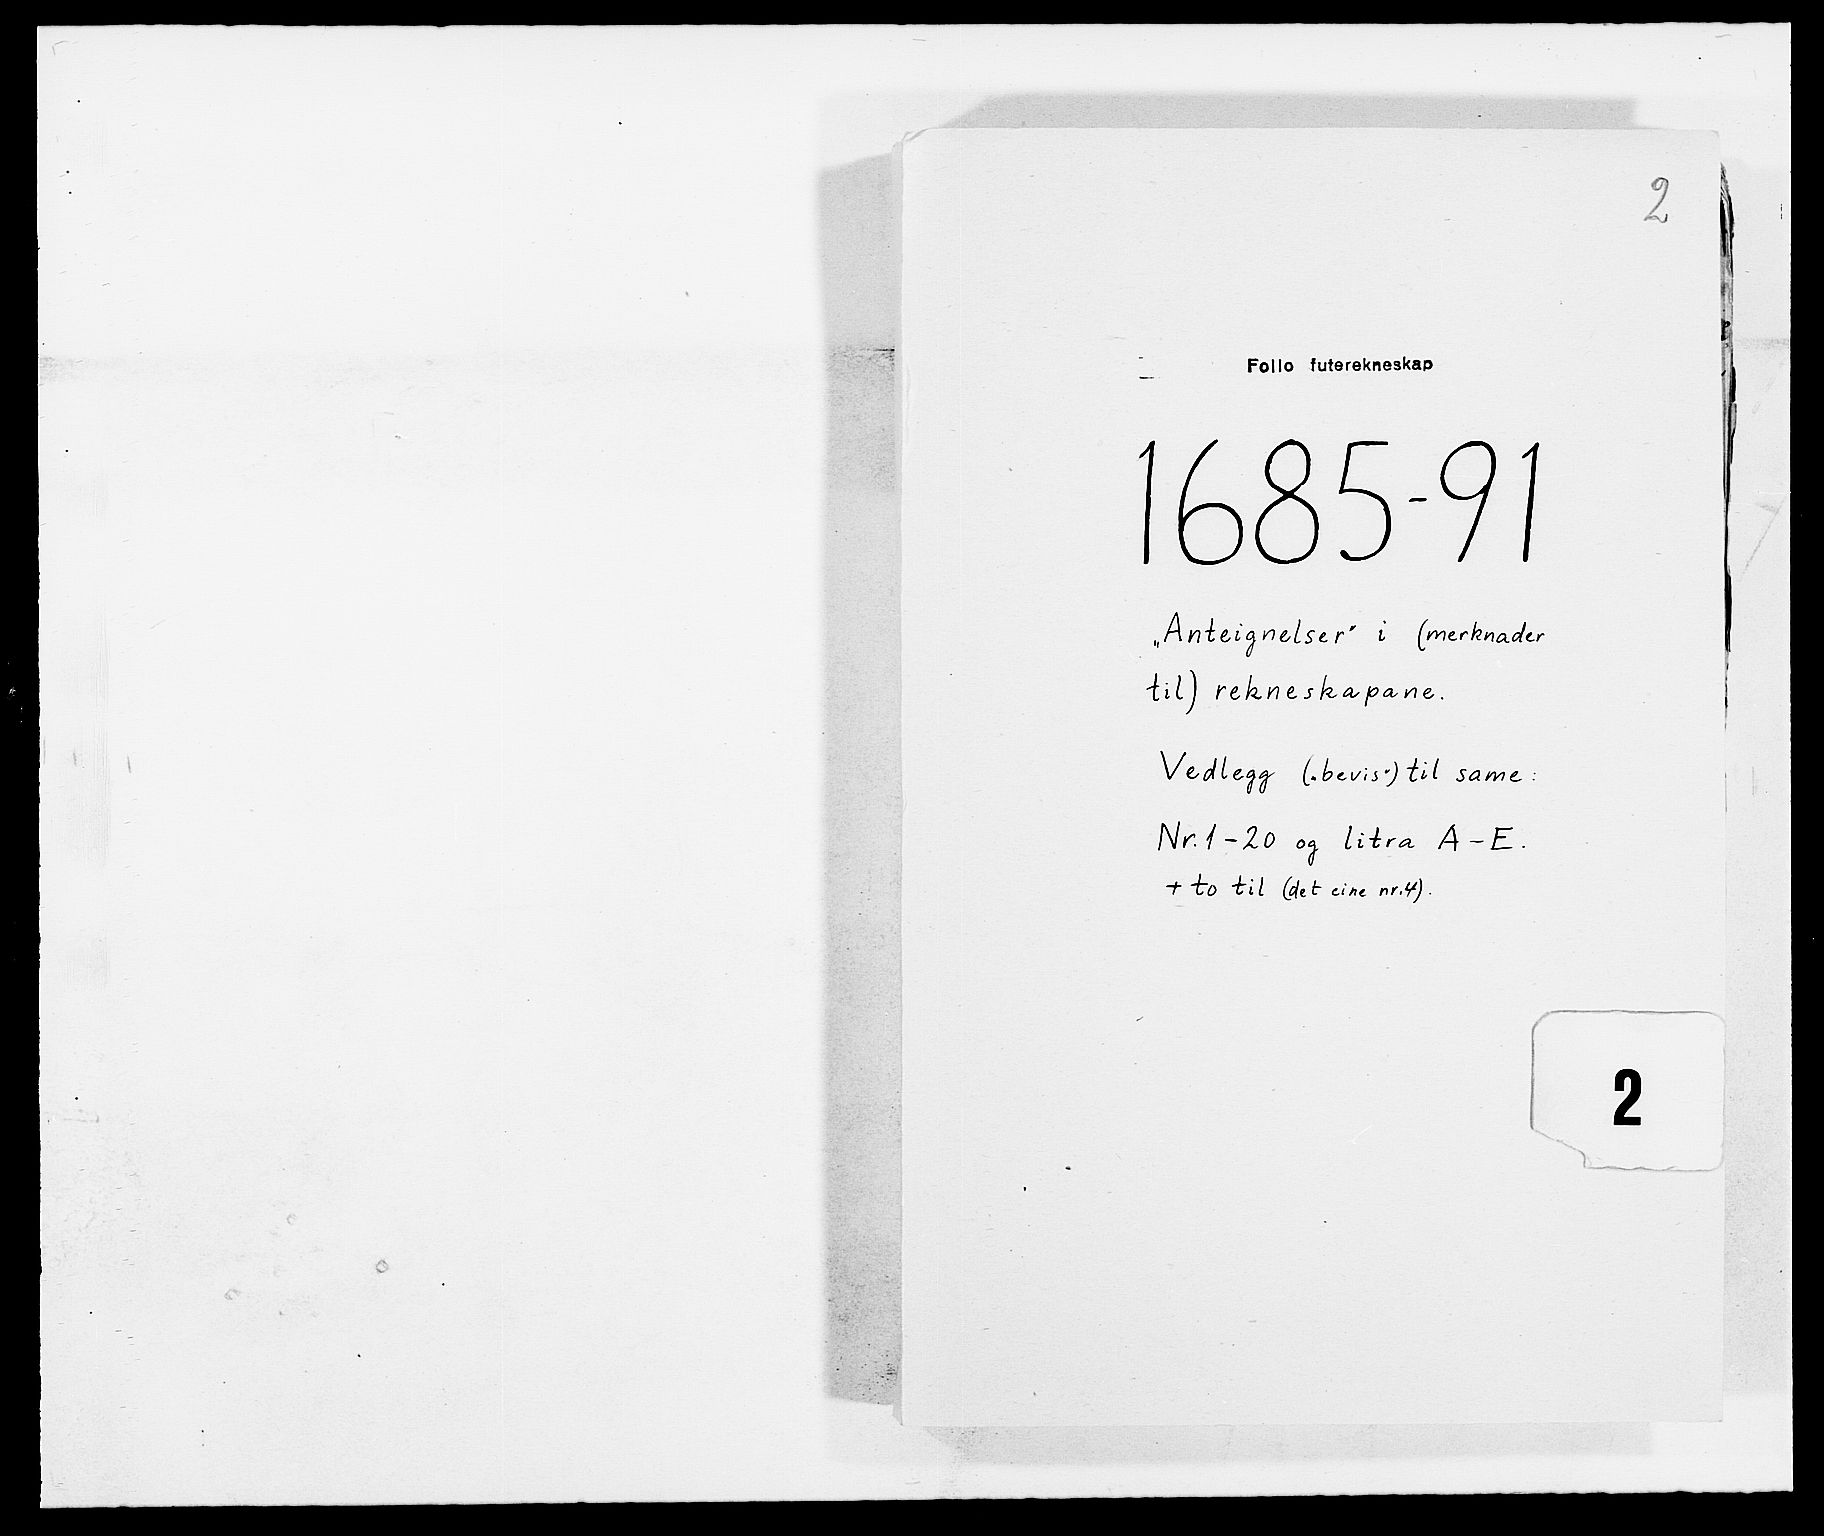 RA, Rentekammeret inntil 1814, Reviderte regnskaper, Fogderegnskap, R09/L0436: Fogderegnskap Follo, 1685-1691, s. 273